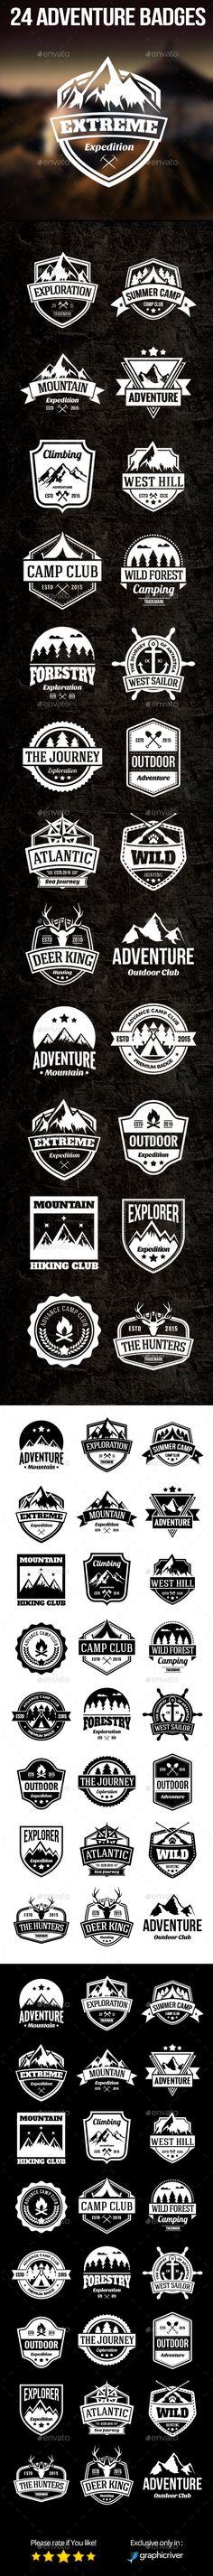 24 Adventure Badges Tempalte #design Download: http://graphicriver.net/item/24-adventure-badges/12535313?ref=ksioks